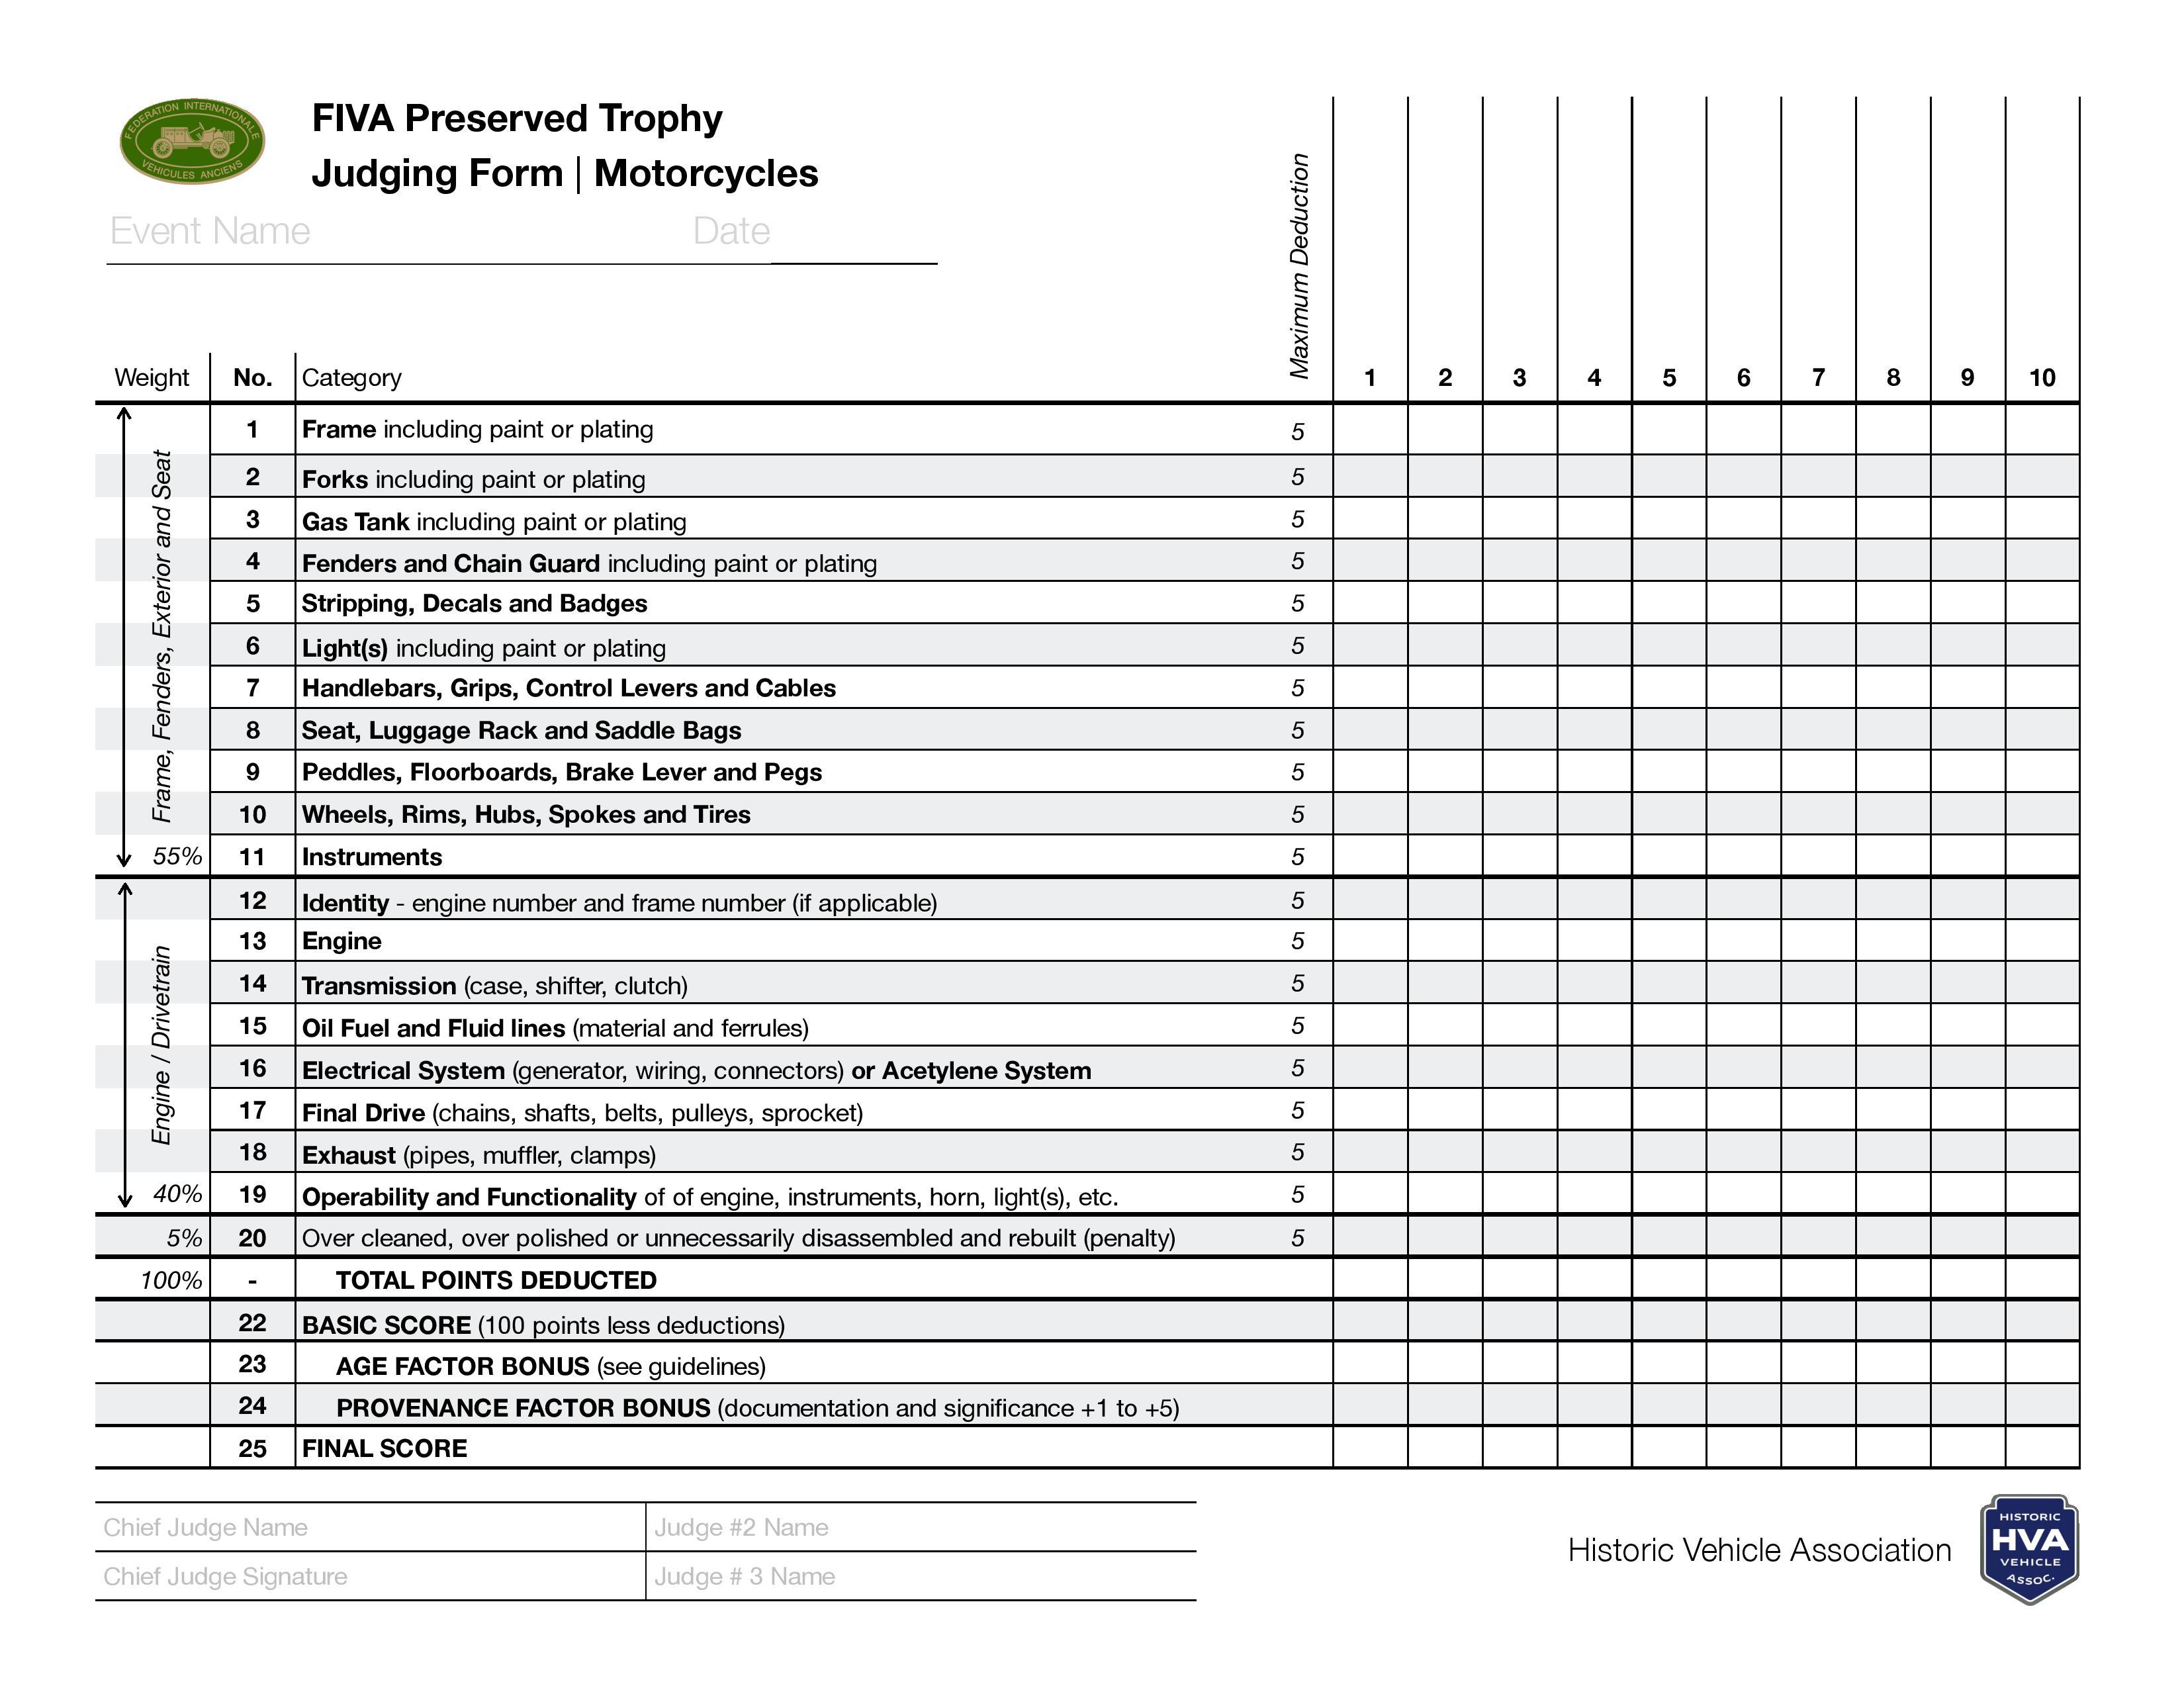 FIVA Preservation Judging MC Form 2015